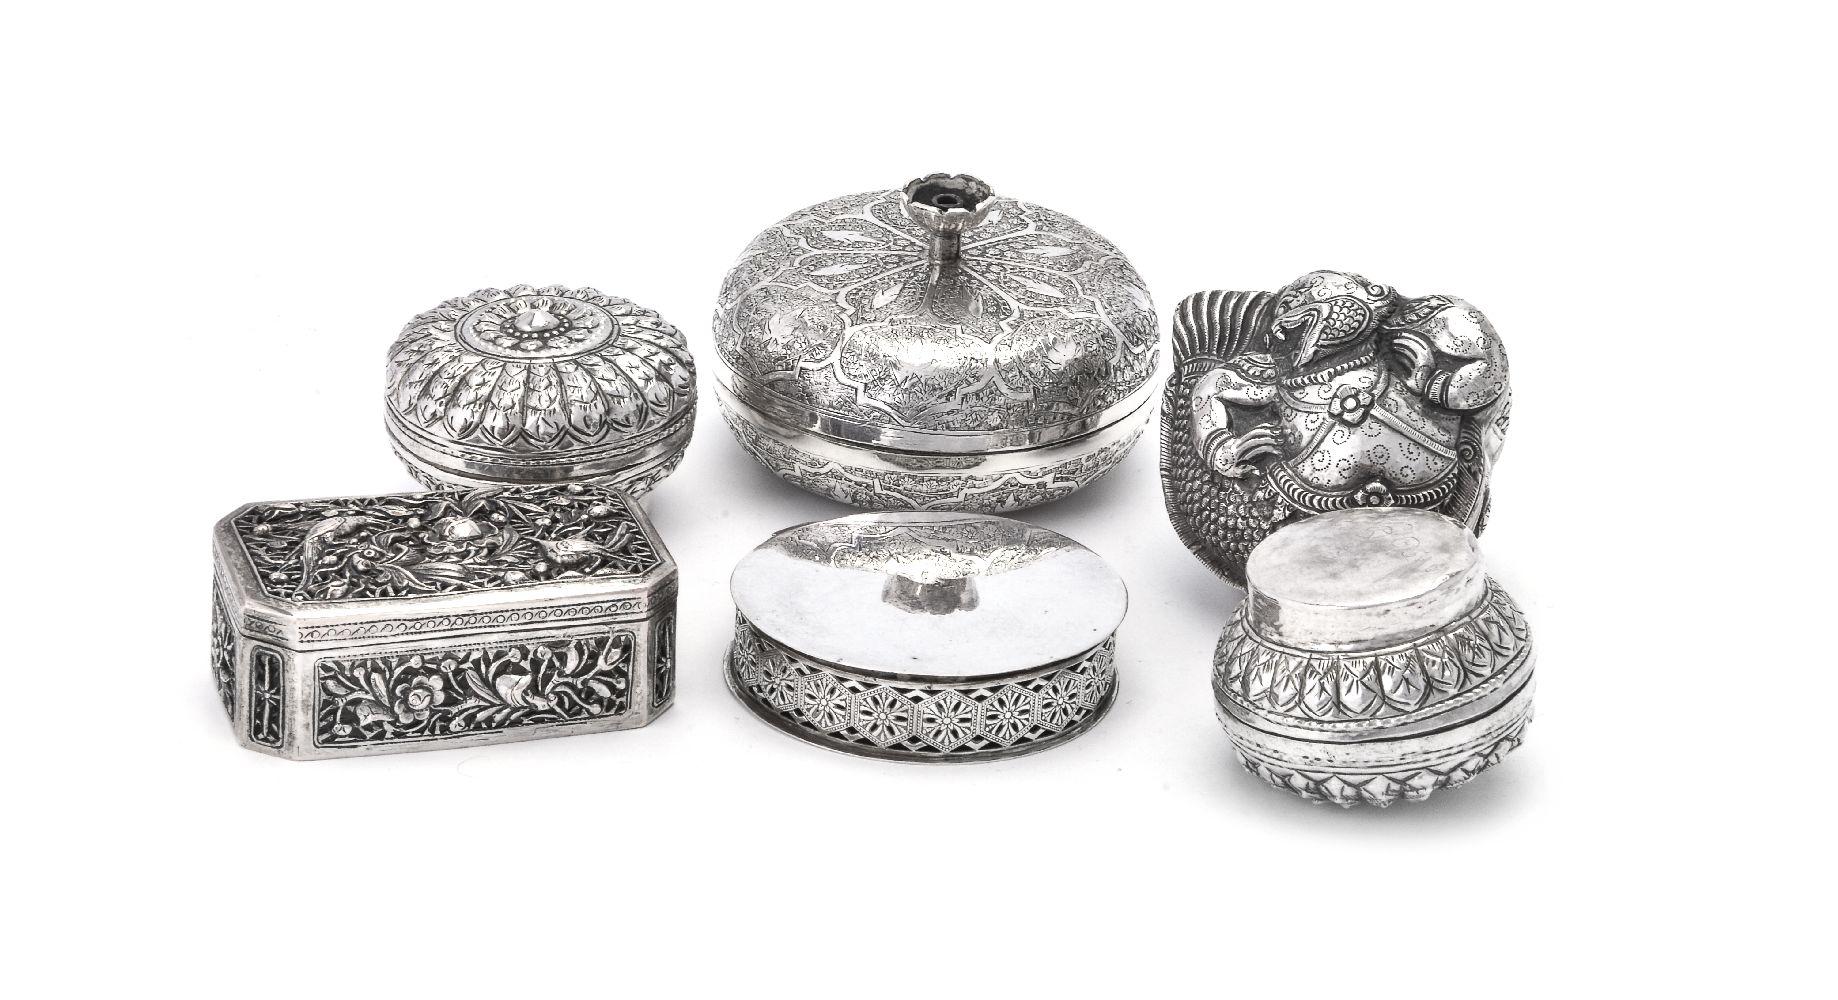 Lot 814 - Five Asian silver boxes